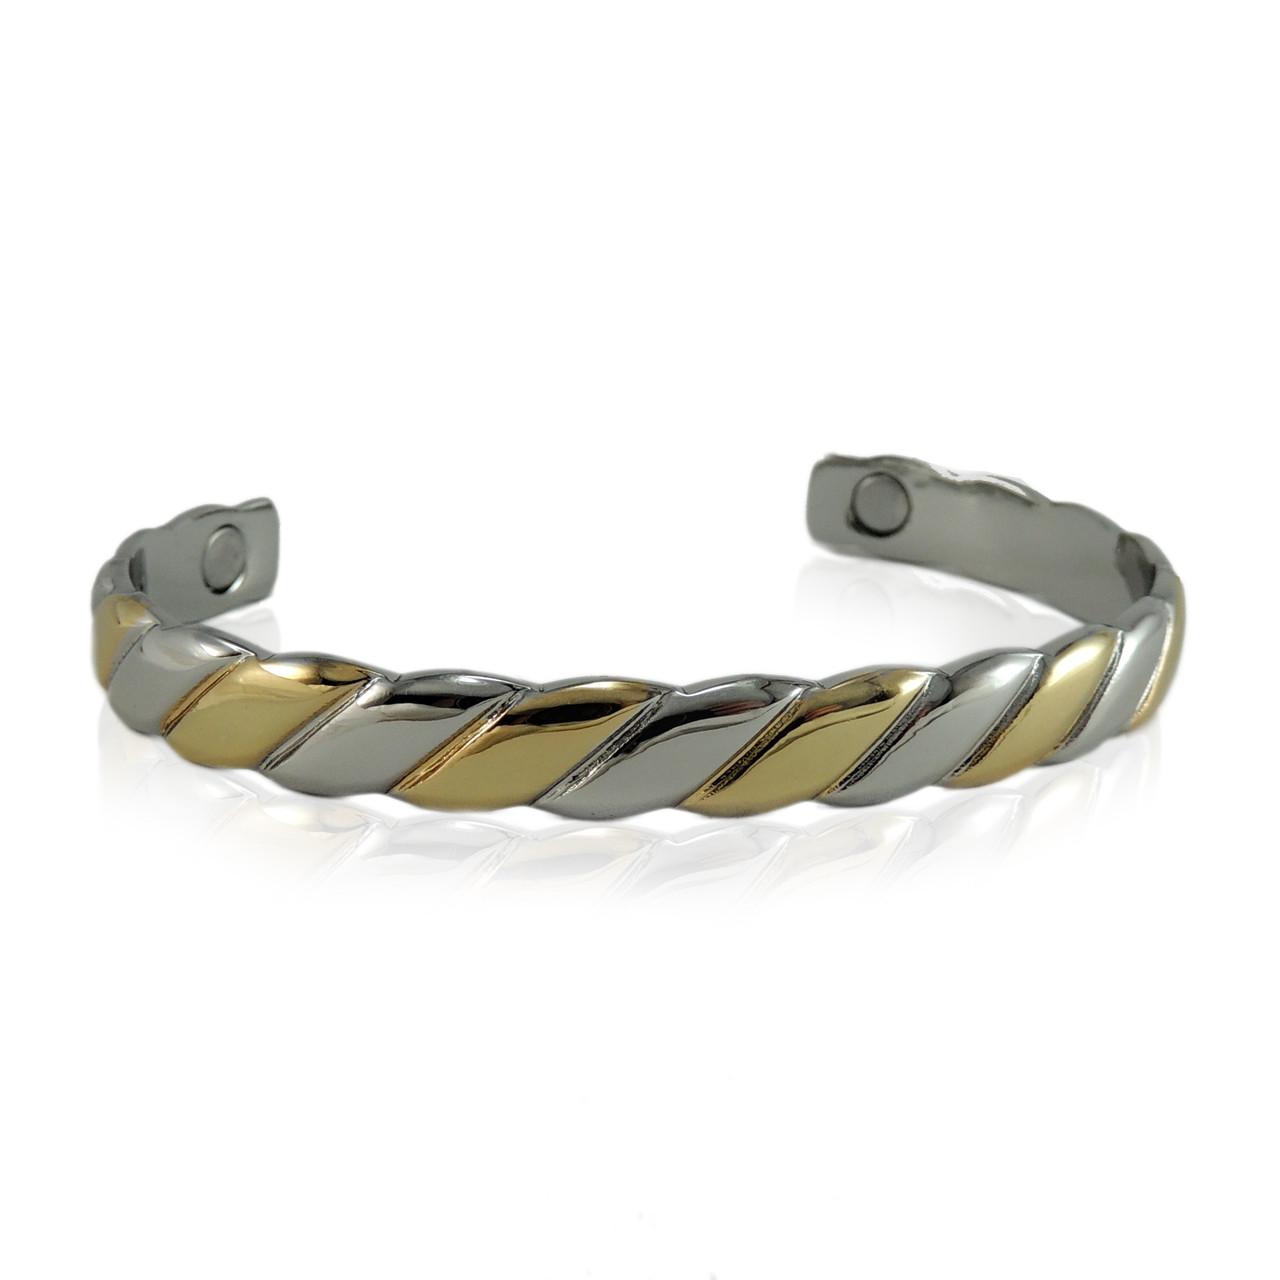 C-KCB197 Copper Bracelet